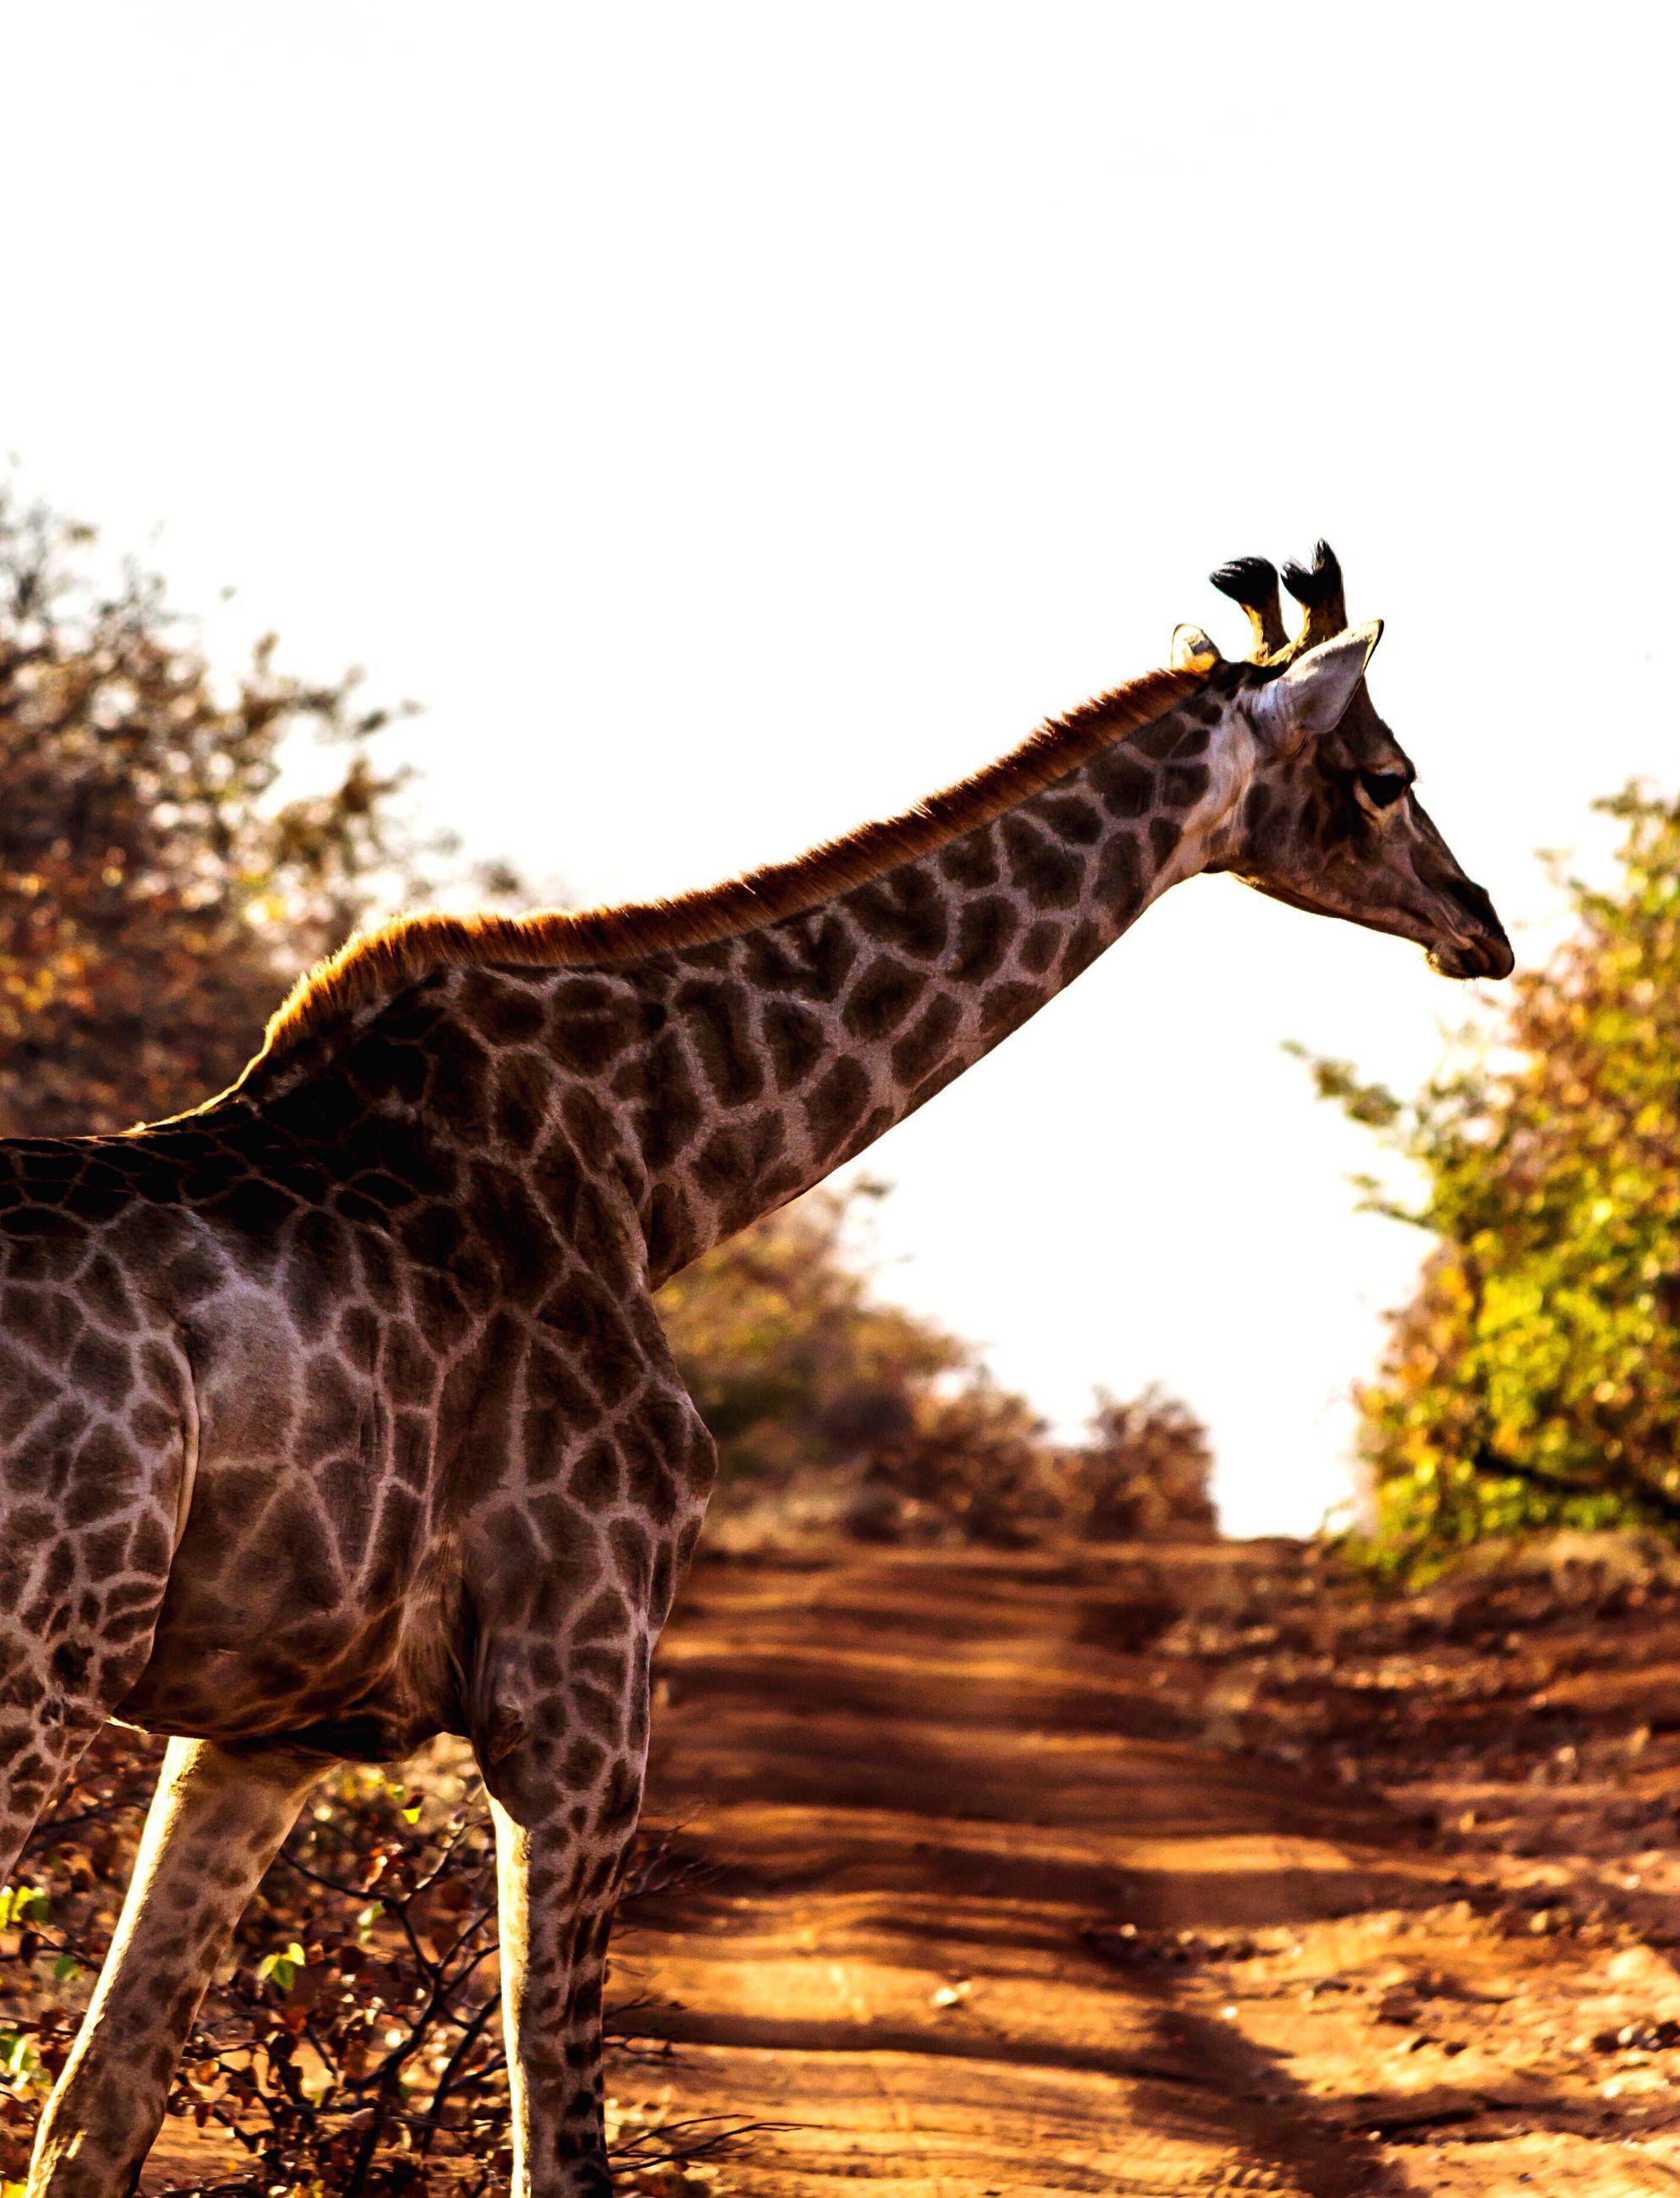 giraffe, animal themes, animals in the wild, one animal, safari animals, animal wildlife, herbivorous, nature, standing, outdoors, mammal, no people, animal markings, day, sky, clear sky, animal neck, tree, grass, animal behavior, hoofed mammal, zebra, nature reserve